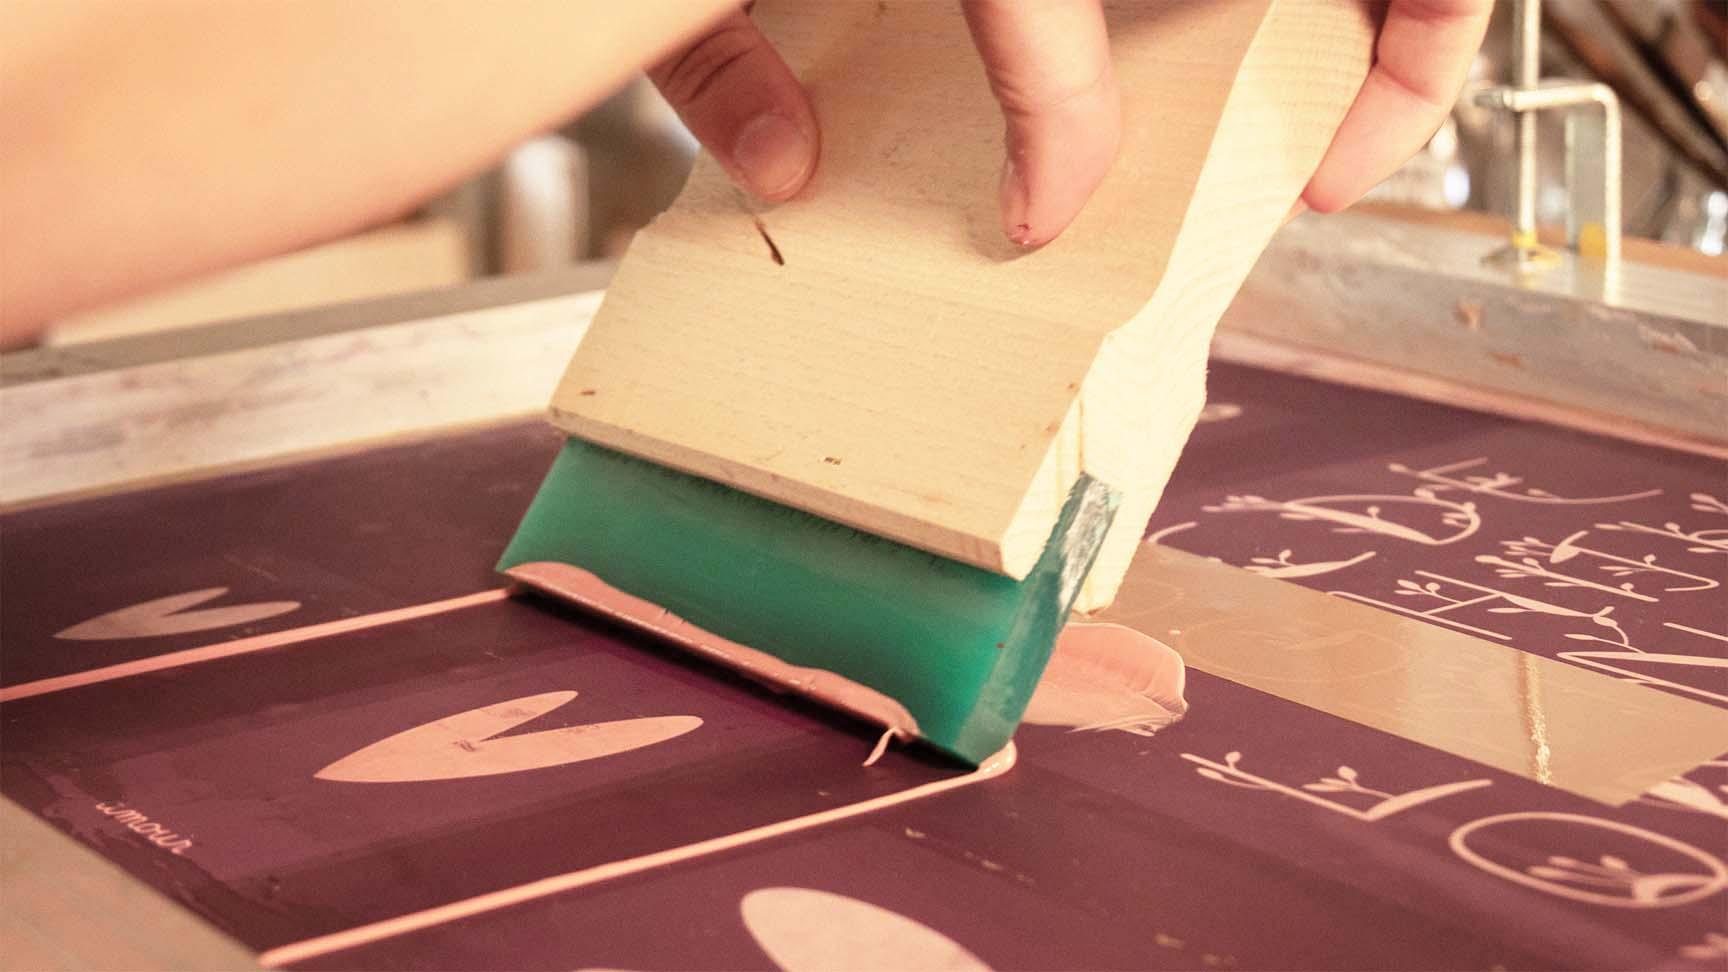 racle-serigraphie-artisanat-atelierdesorg- copie copie